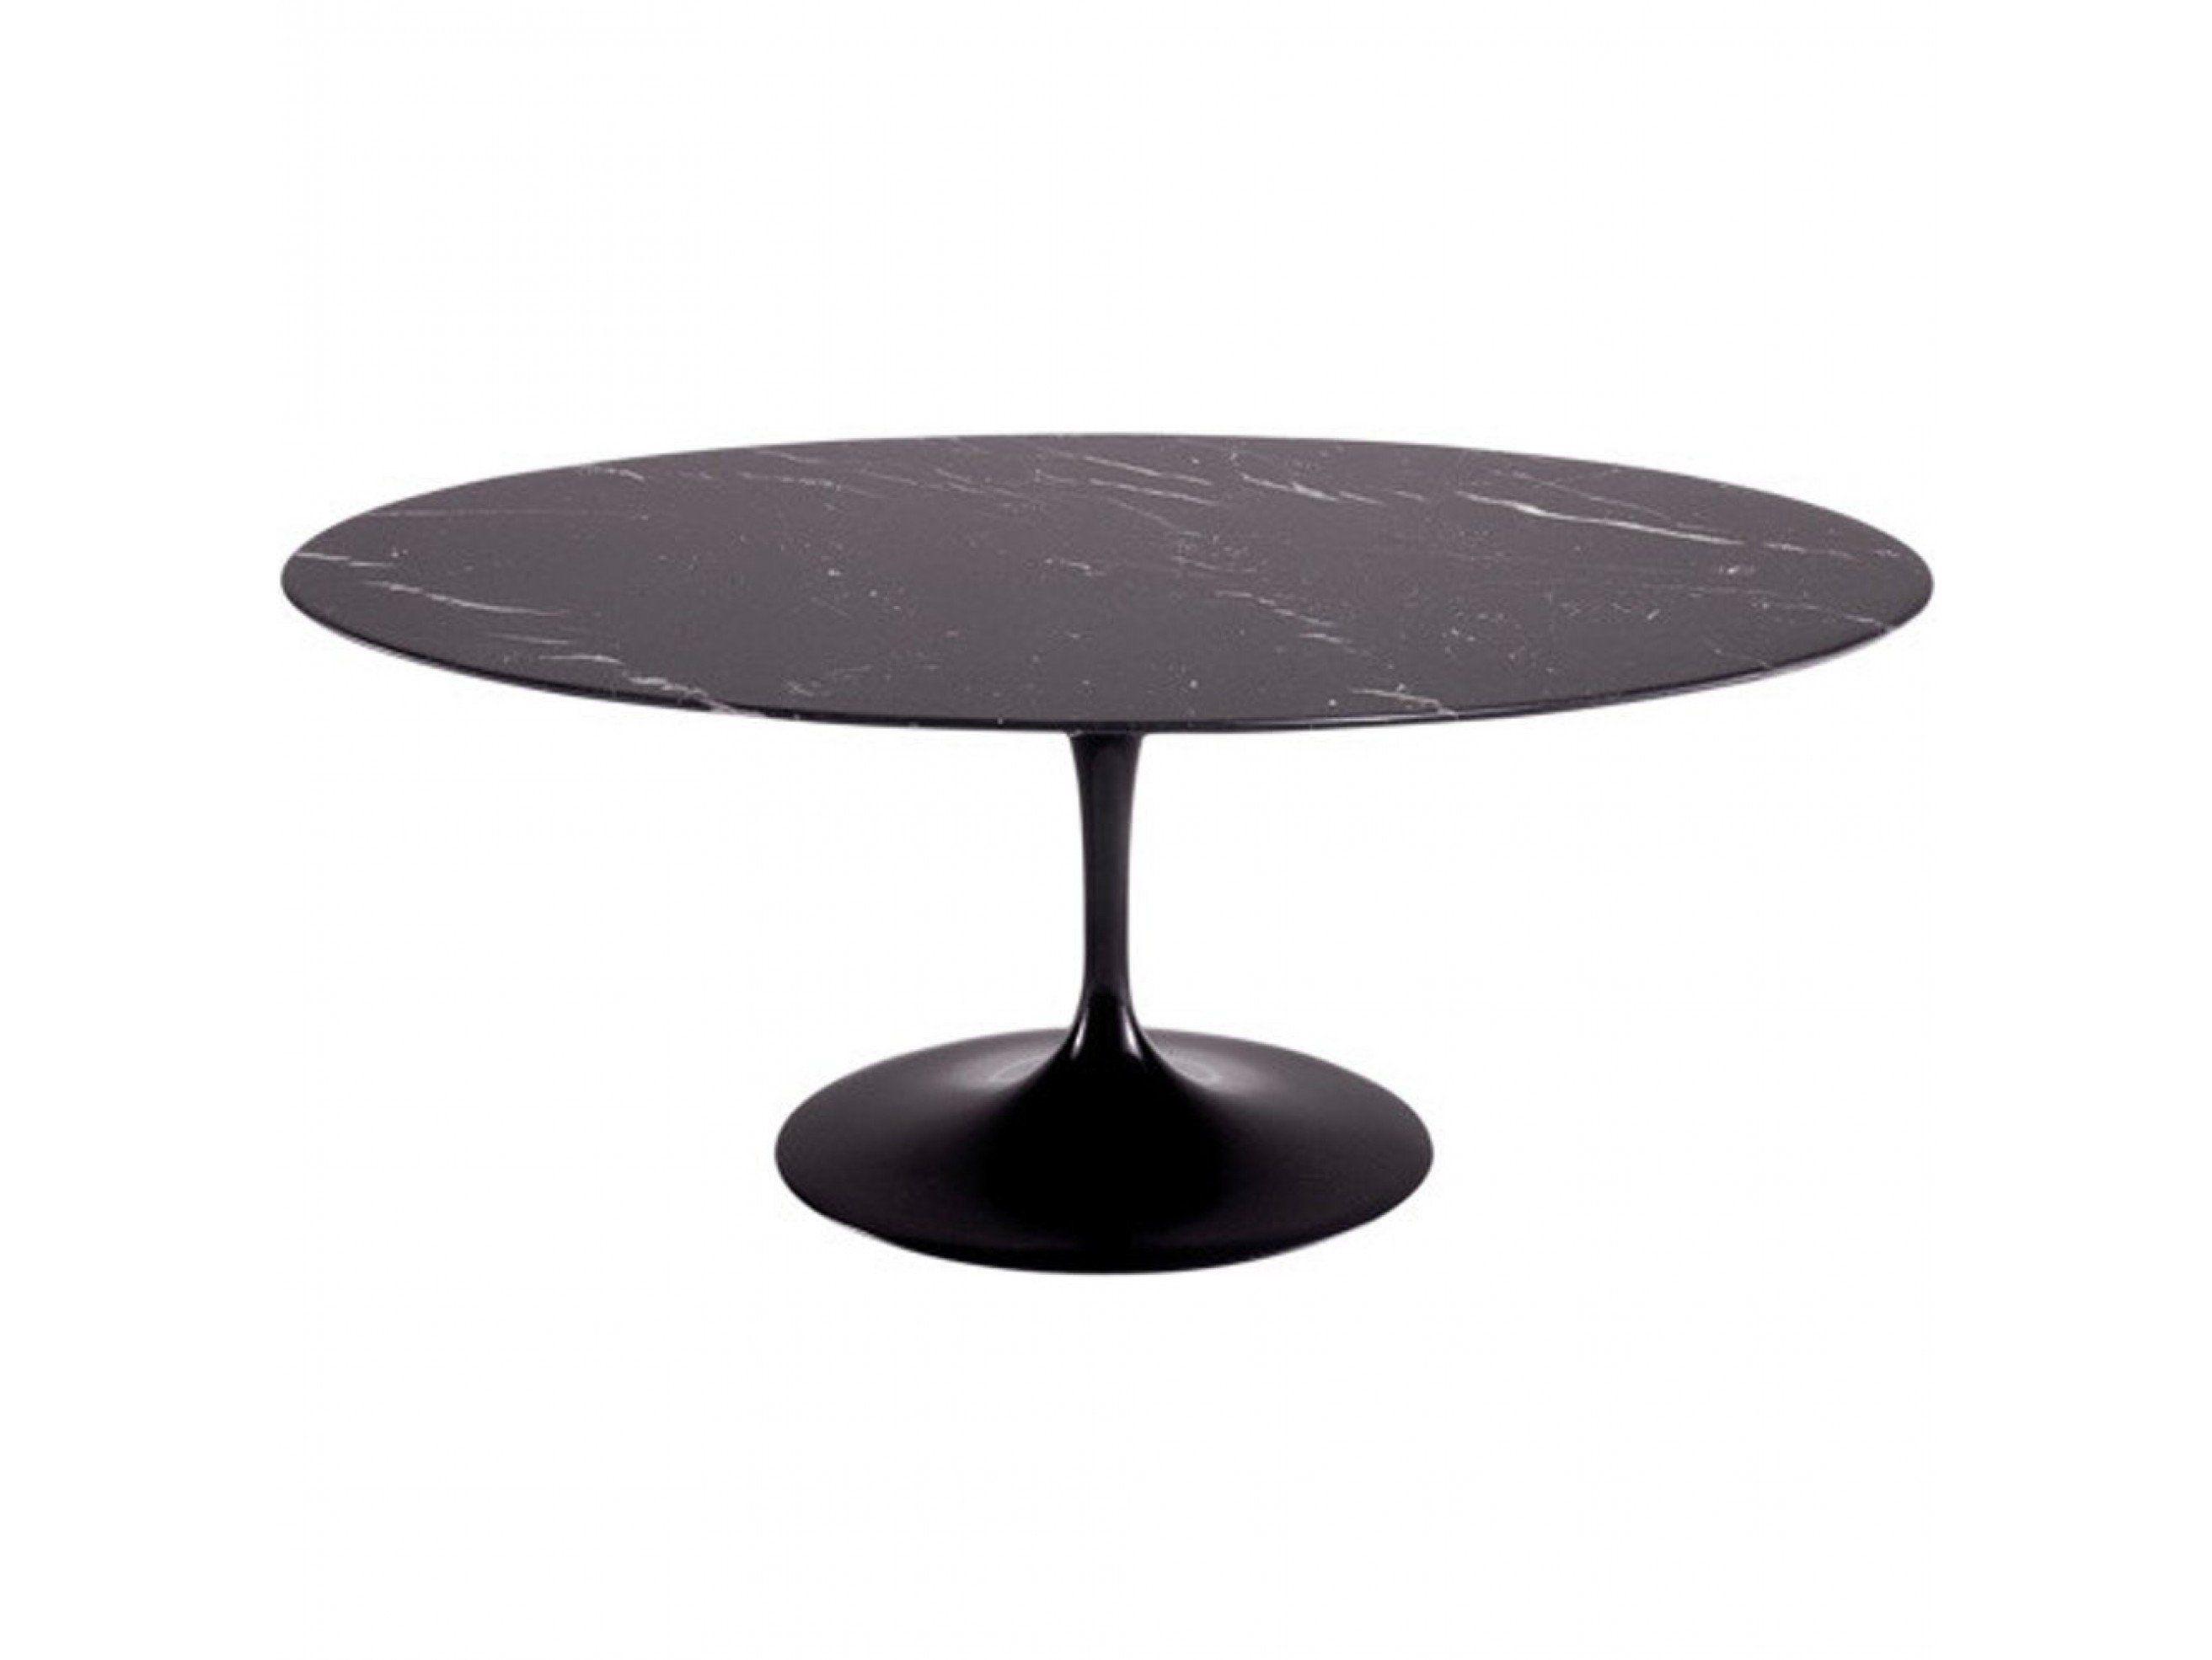 eero saarinen tulip style oval marble top table 78 m d d